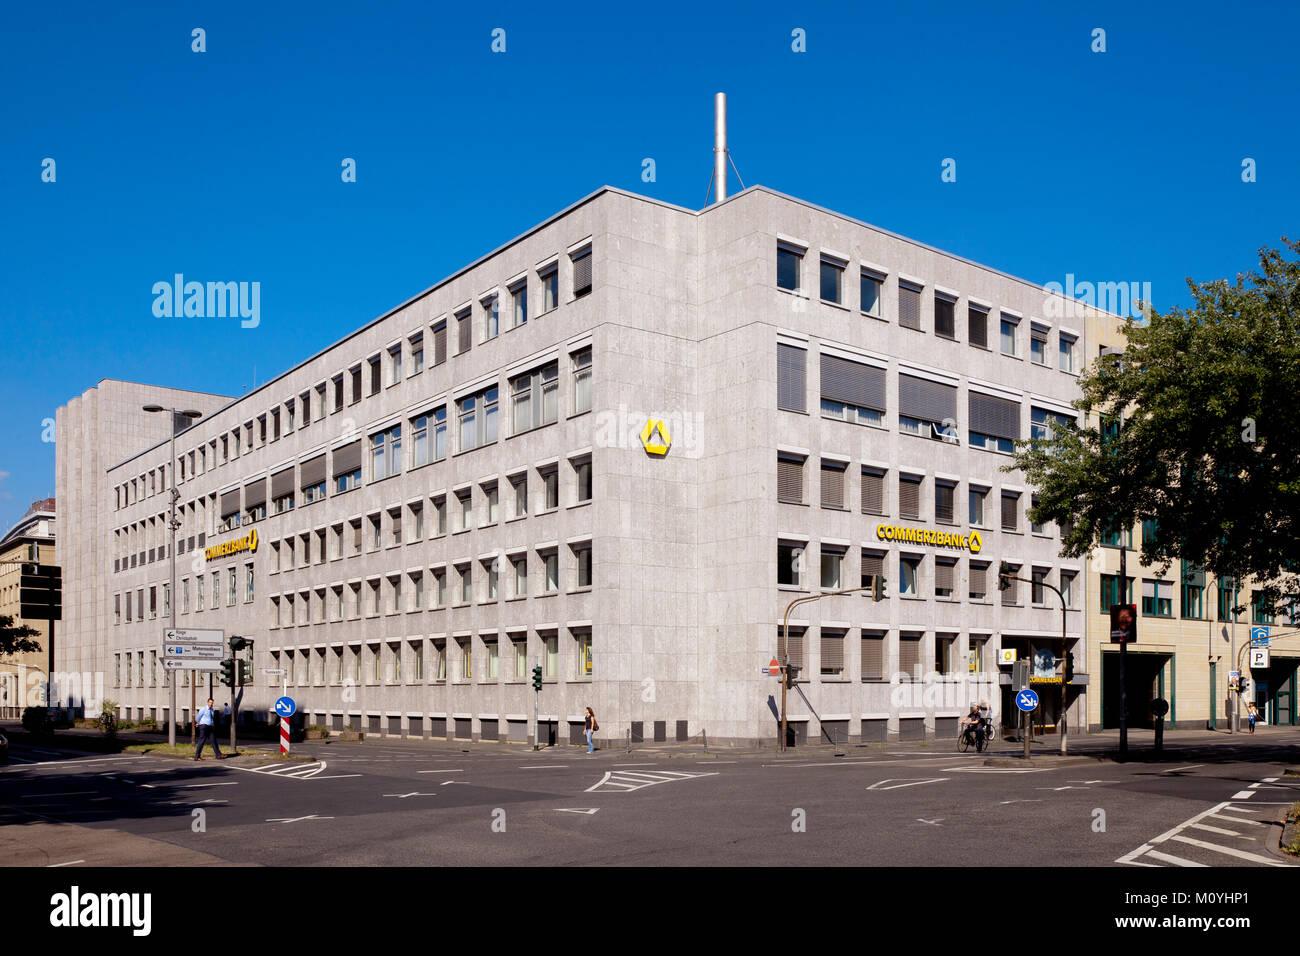 Germany, Cologne, the Commerzbank in the financial district.  Deutschland, Koeln, die Commerzbank im Bankenviertel. - Stock Image